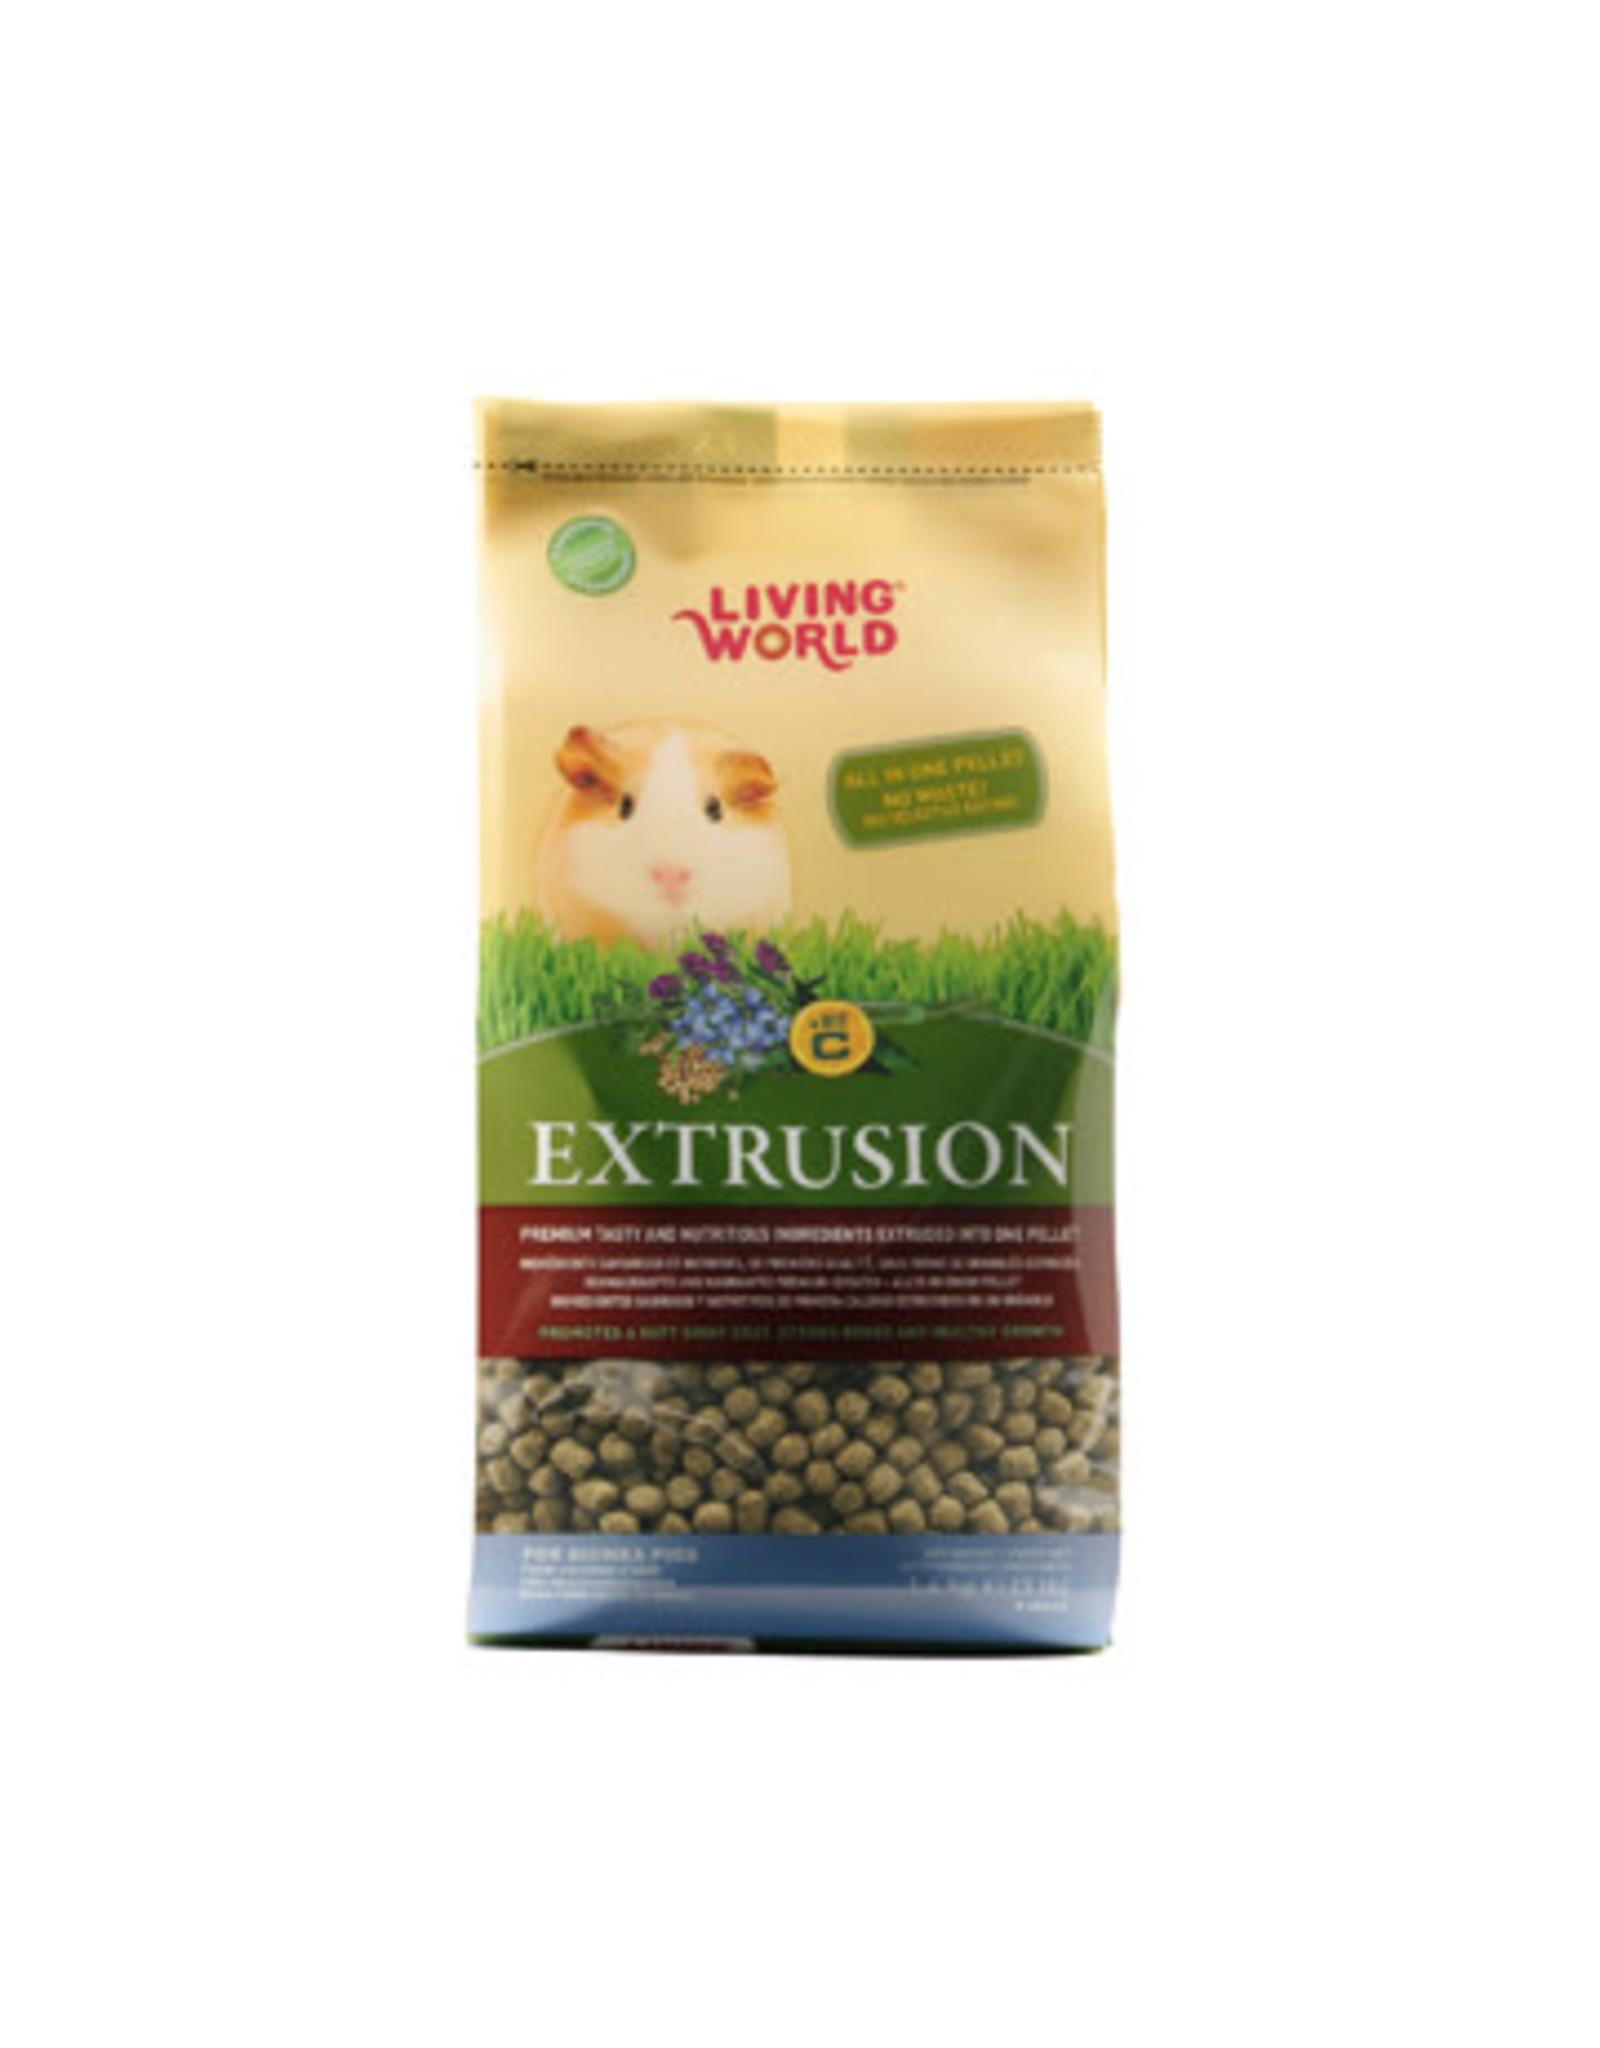 Living World Living World Extrusion Diet for Guinea Pigs - 1.4 kg (3.3 lb)